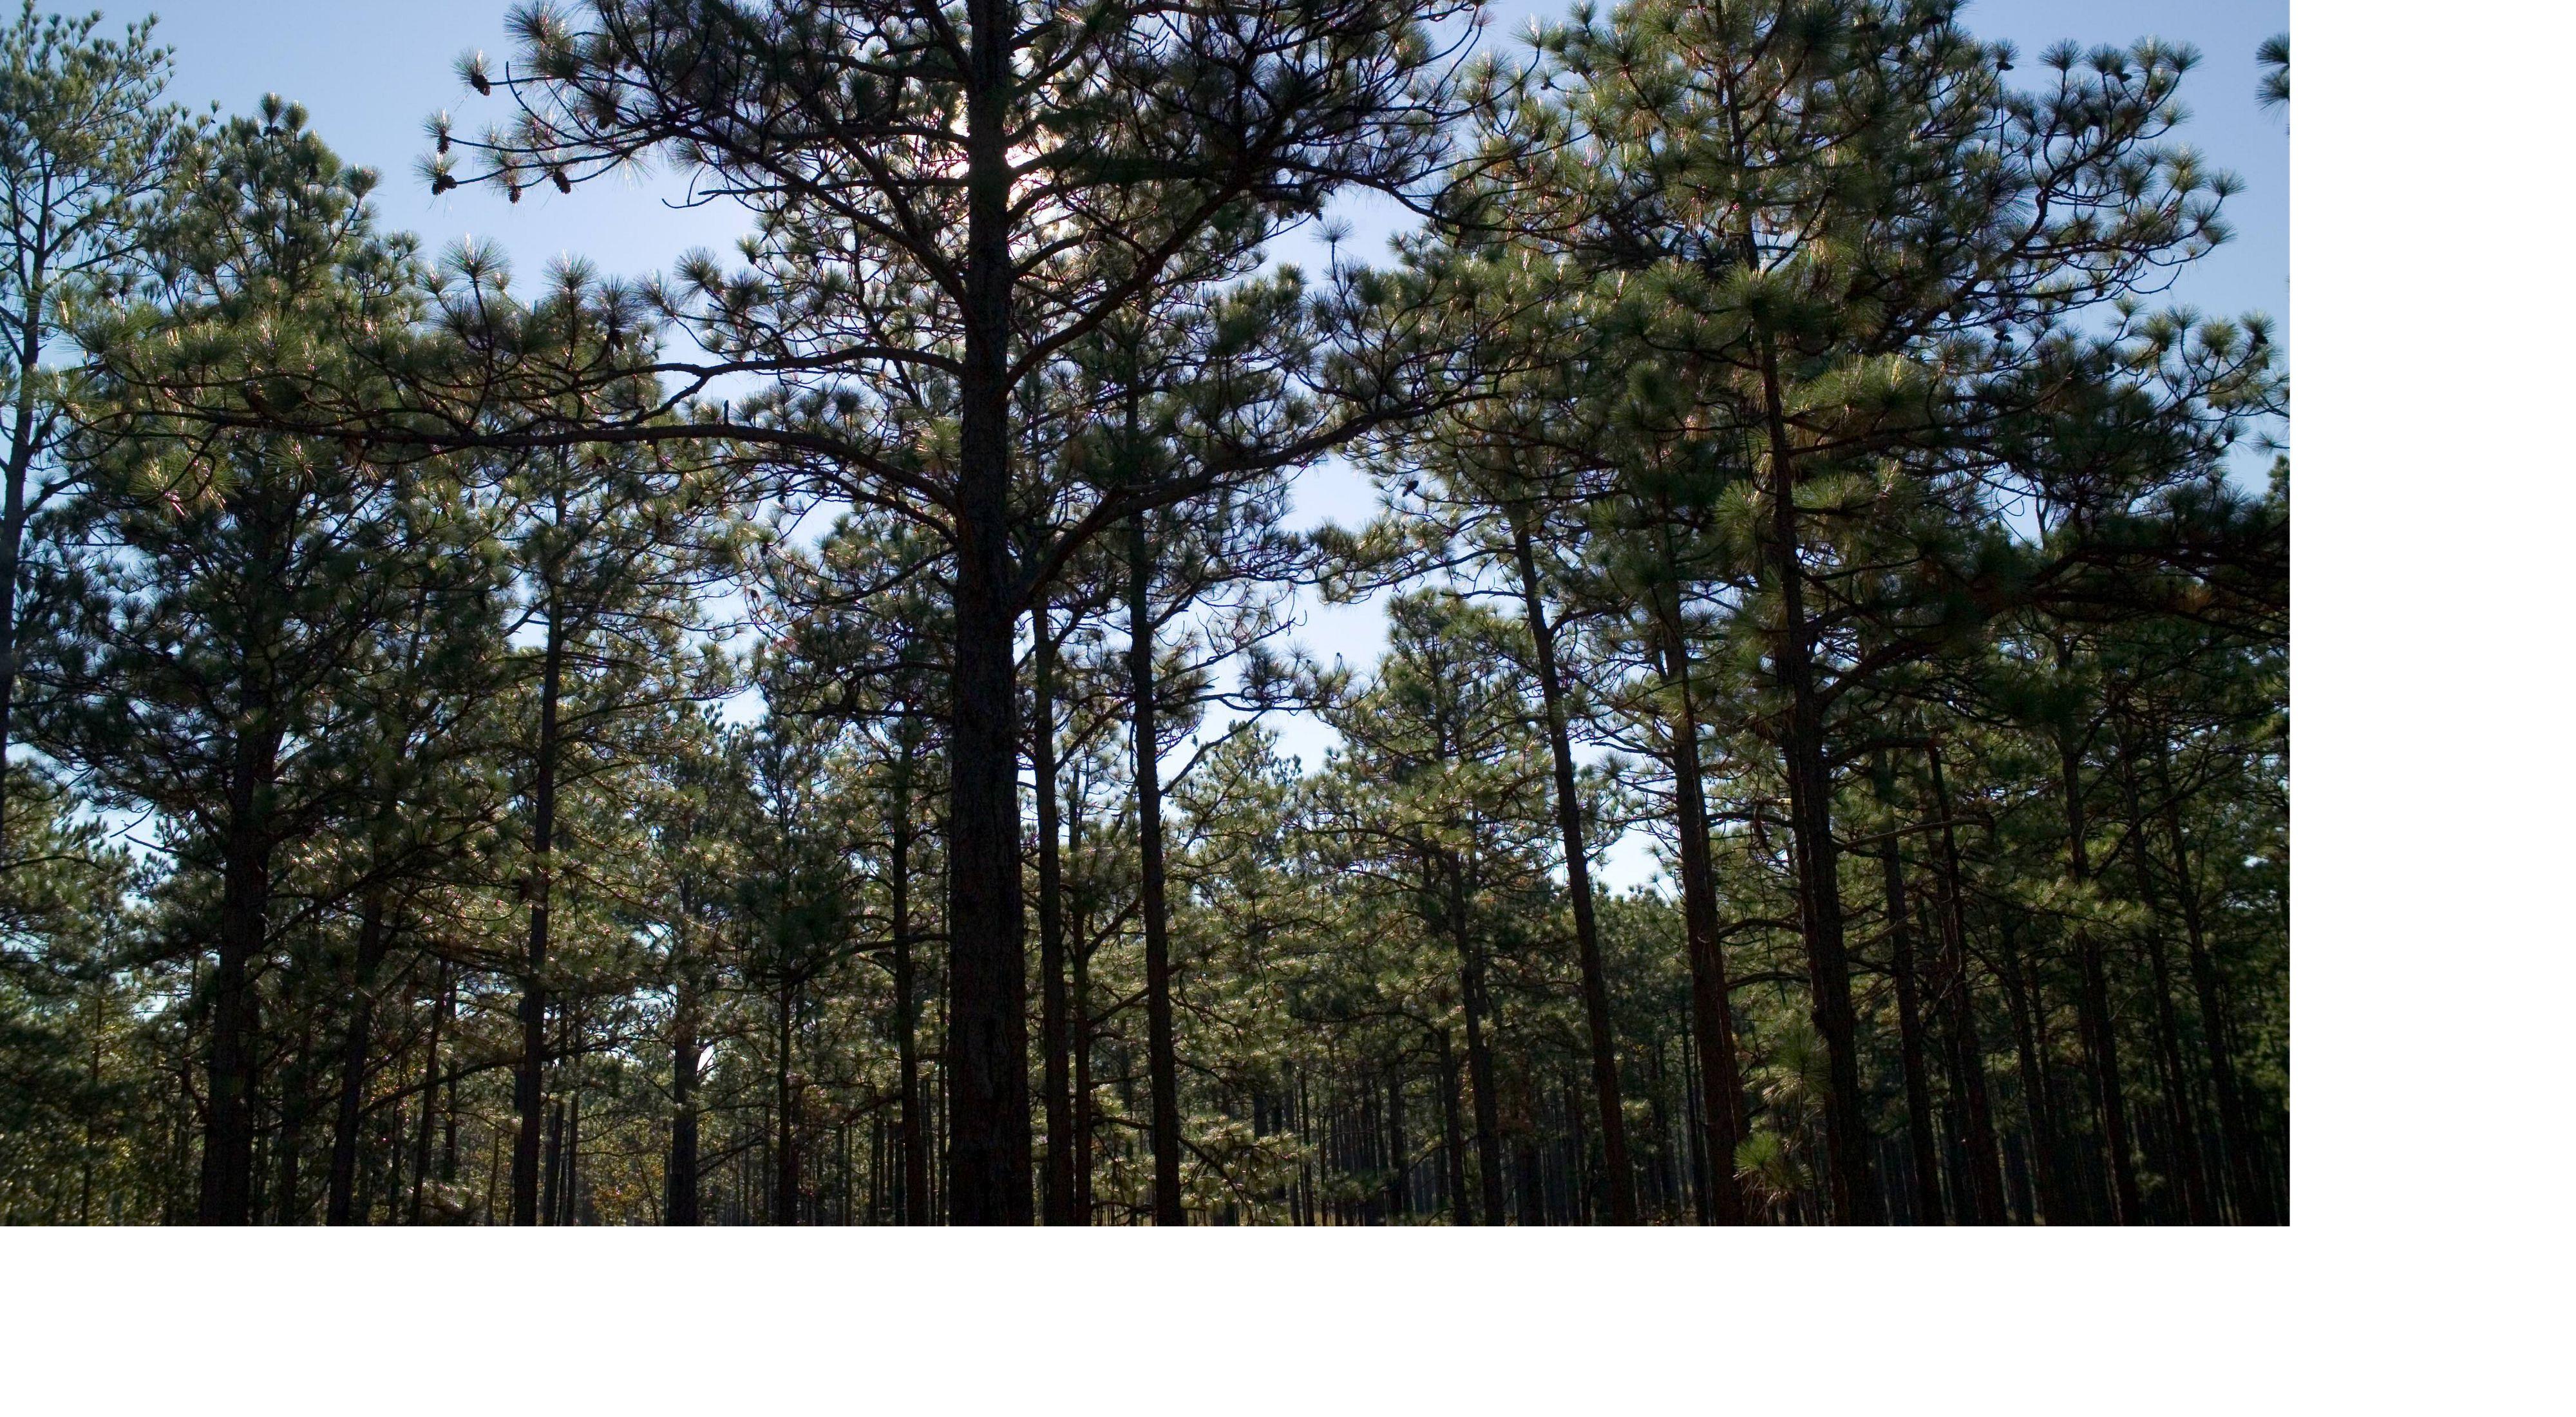 Longleaf pine fort Benning 640x400